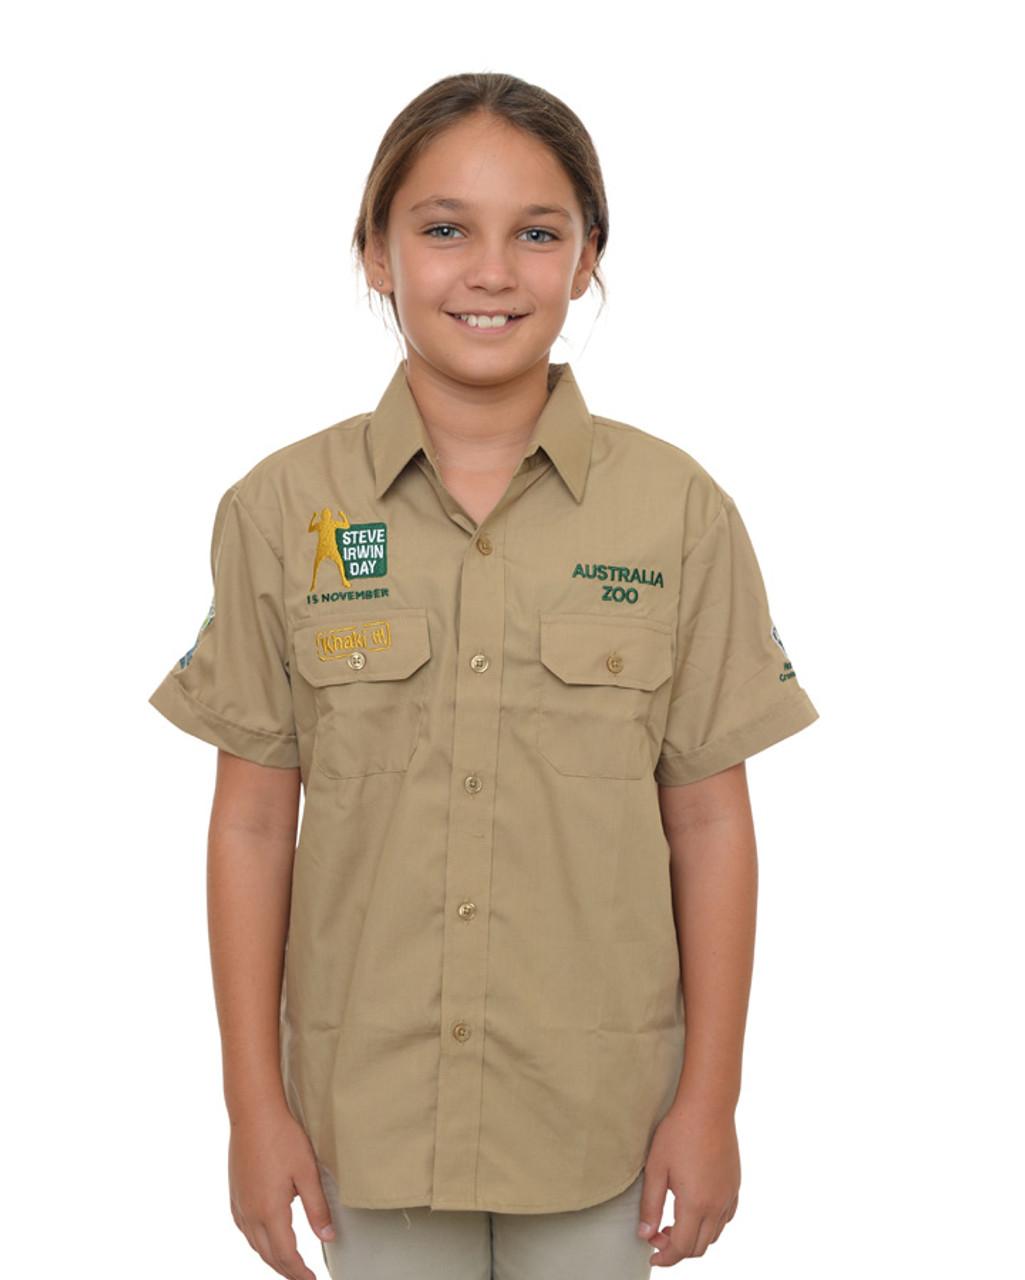 Steve Irwin Day Khaki Shirt Kids